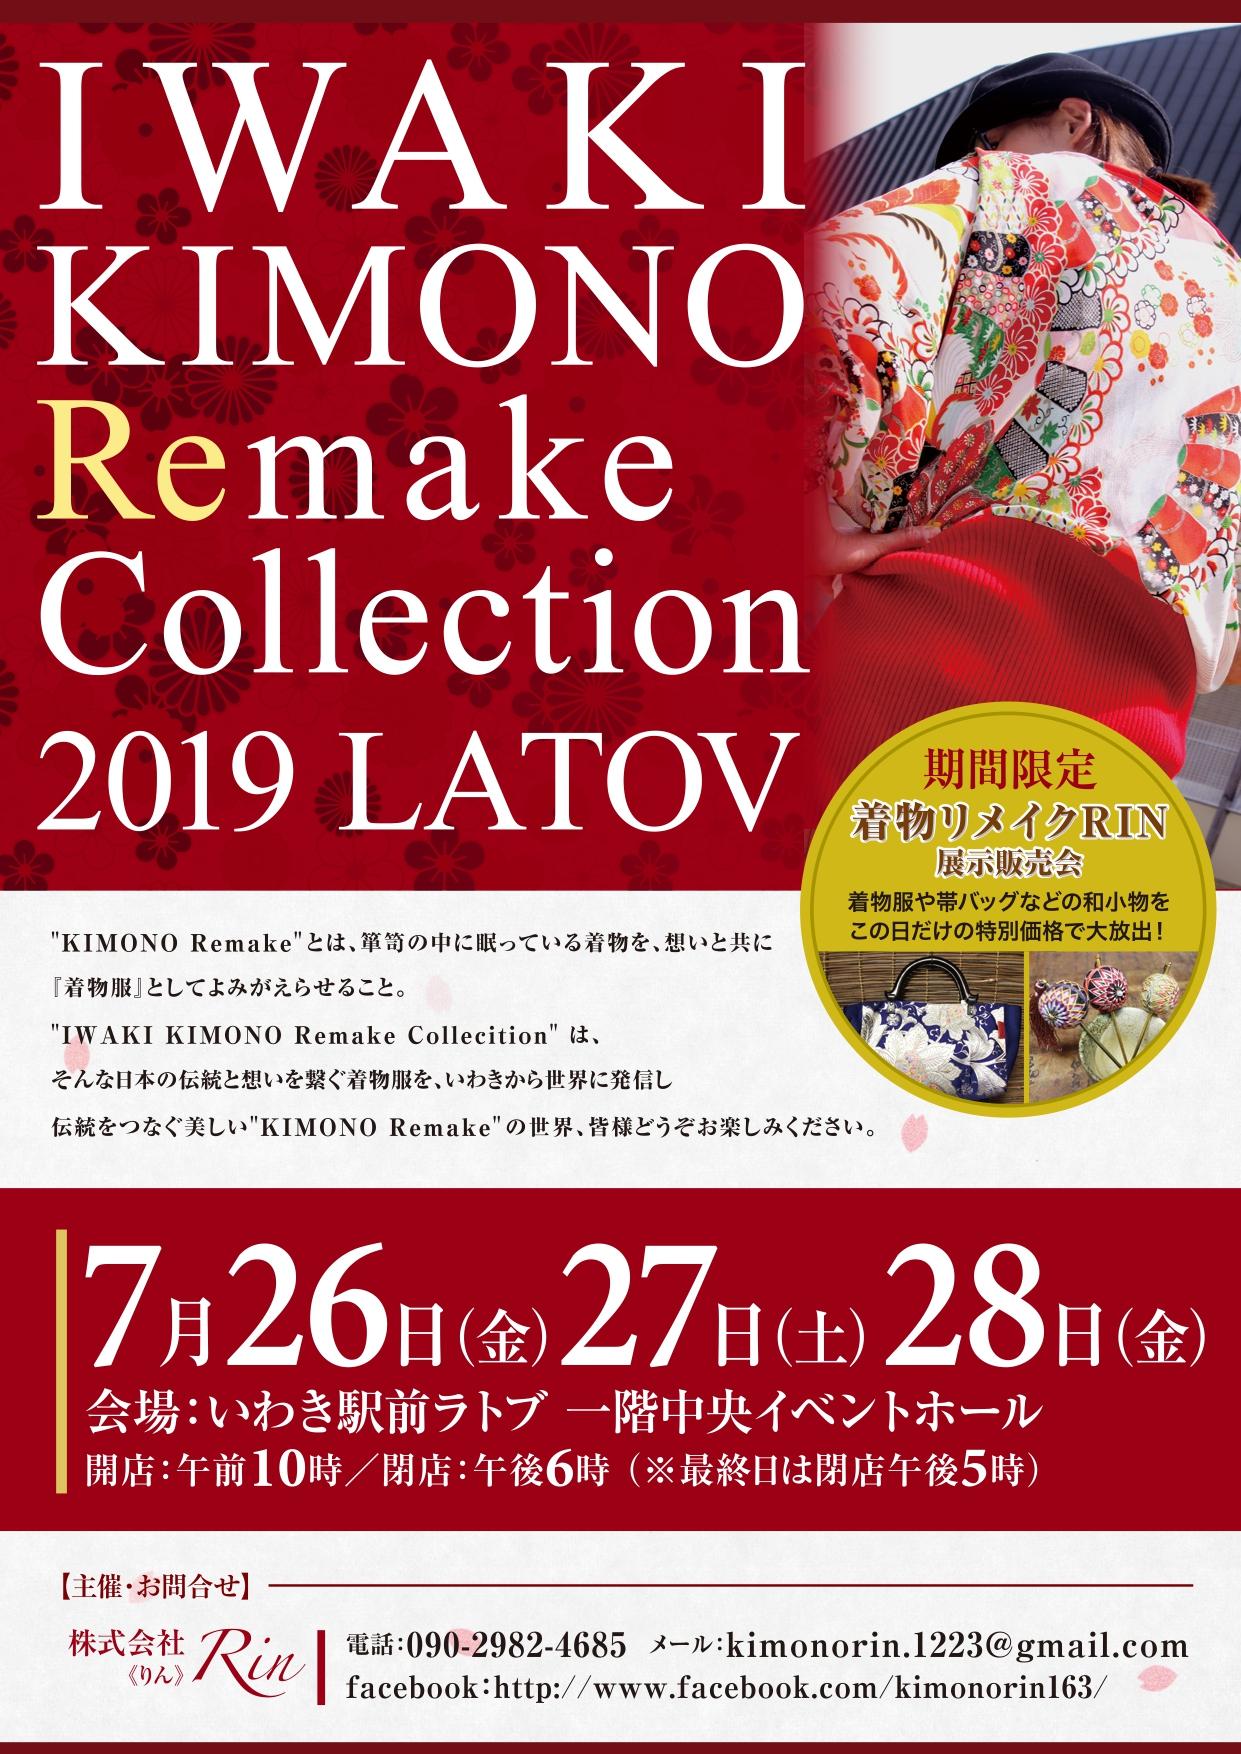 IWAKI KIMONO Remake Collection【7月26日~28日】